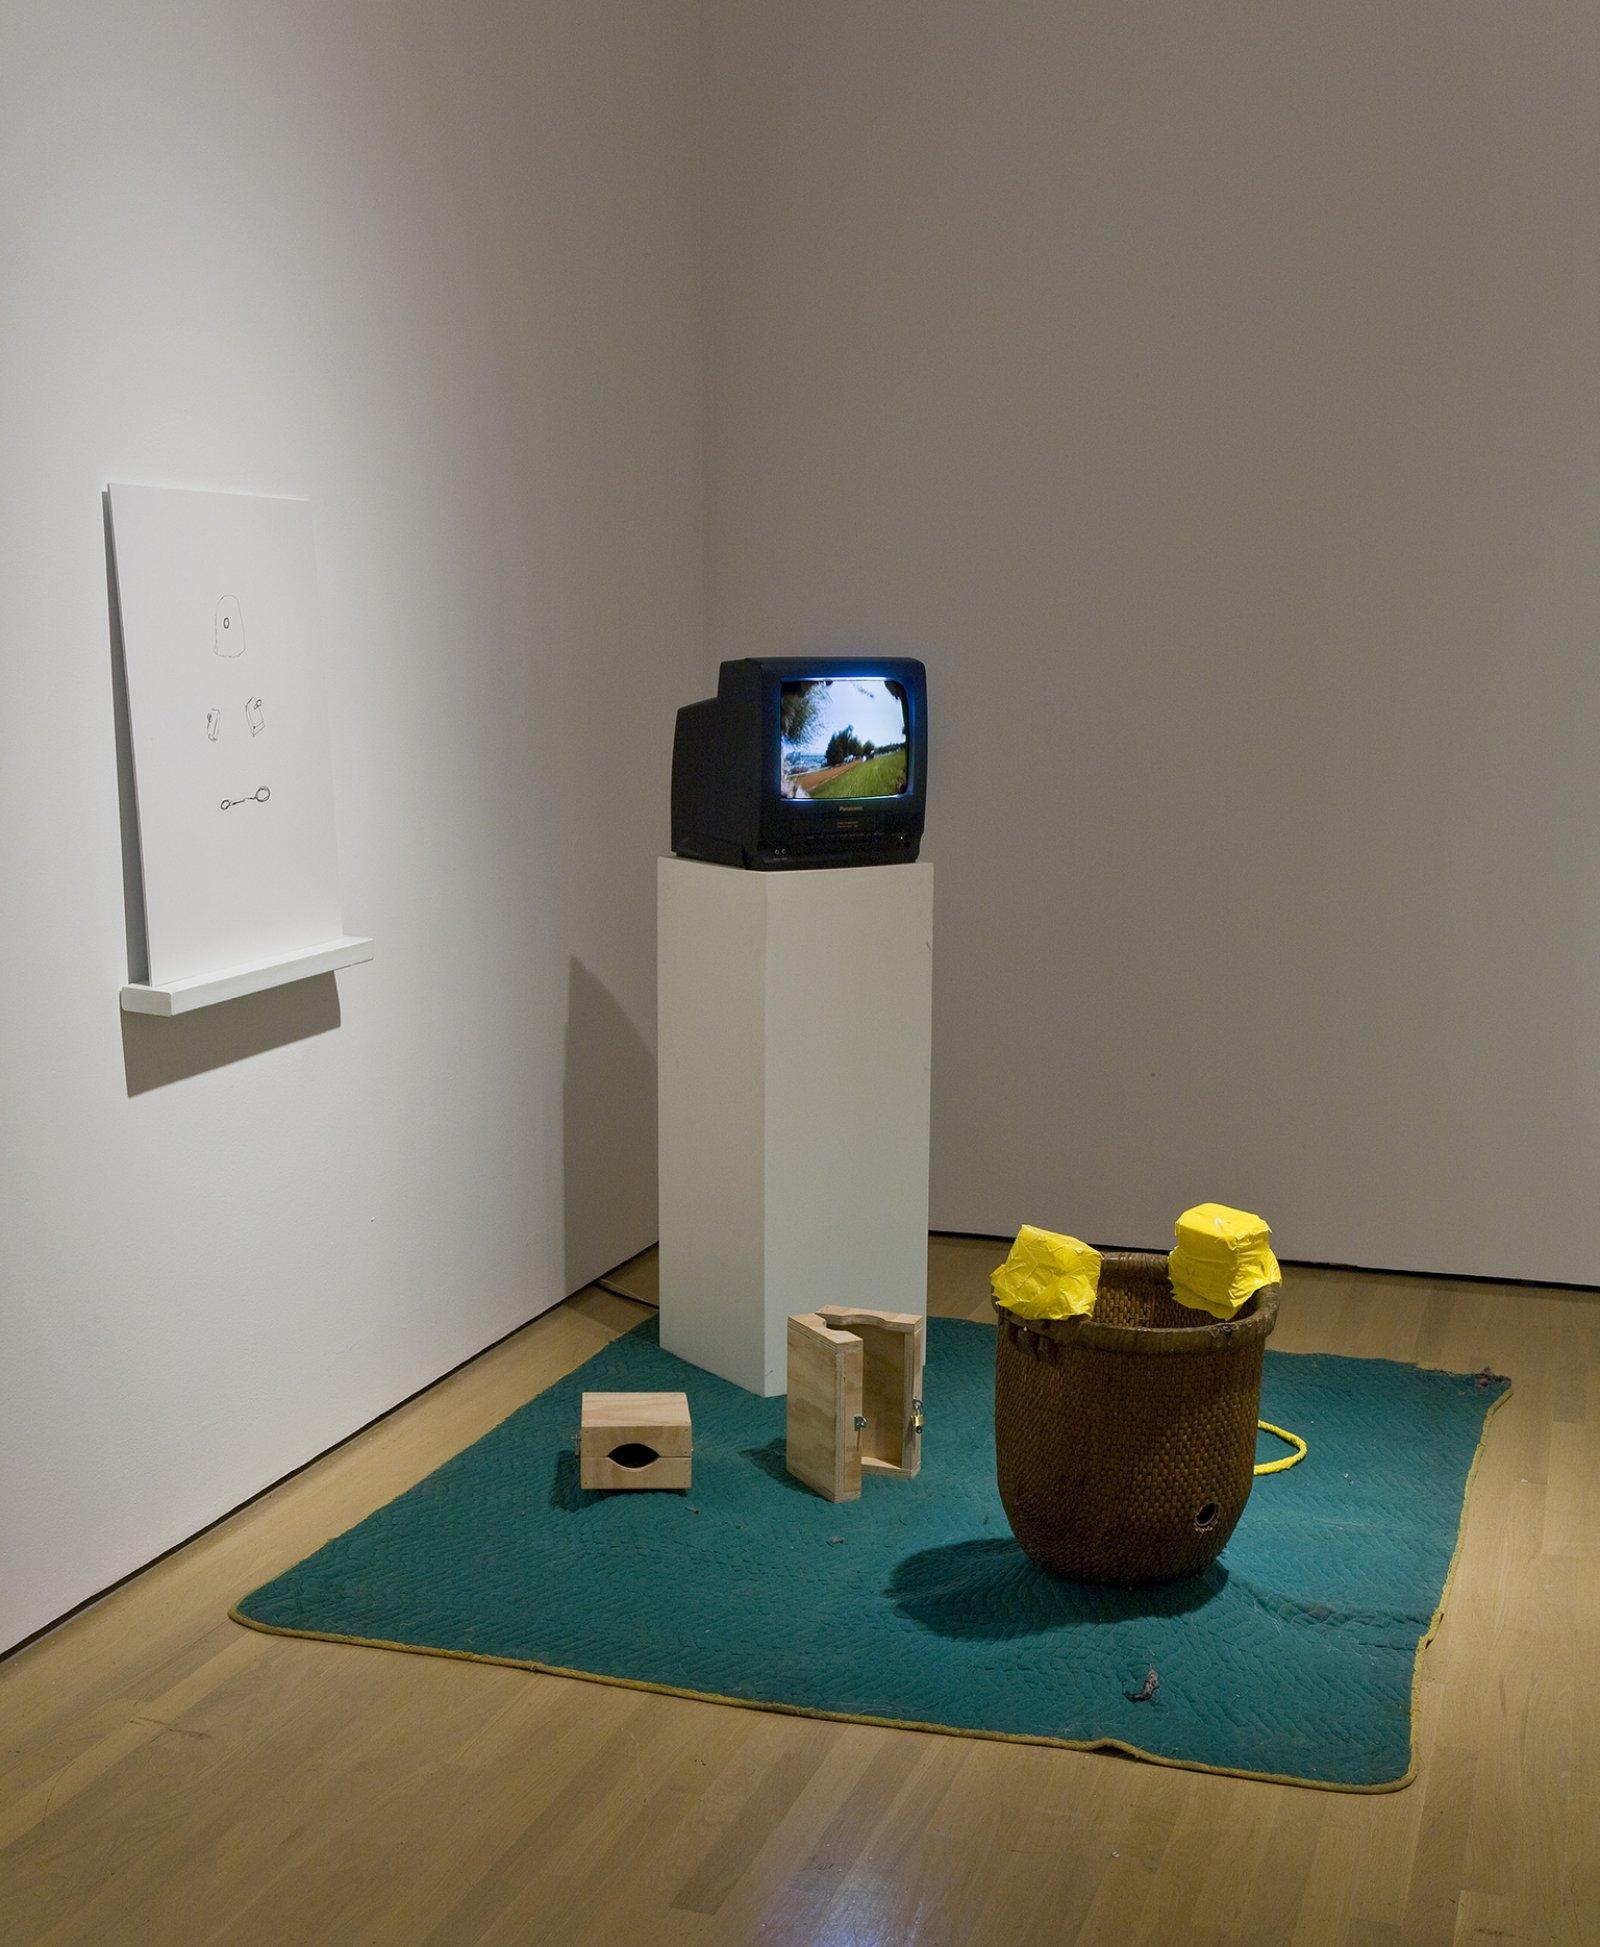 Geoffrey Farmer, Actor / Dancer / Carver, 2003, lightjet print, basket, wood, rope, VHS video loop, video camera, monitor, various materials, dimensions variable by Geoffrey Farmer